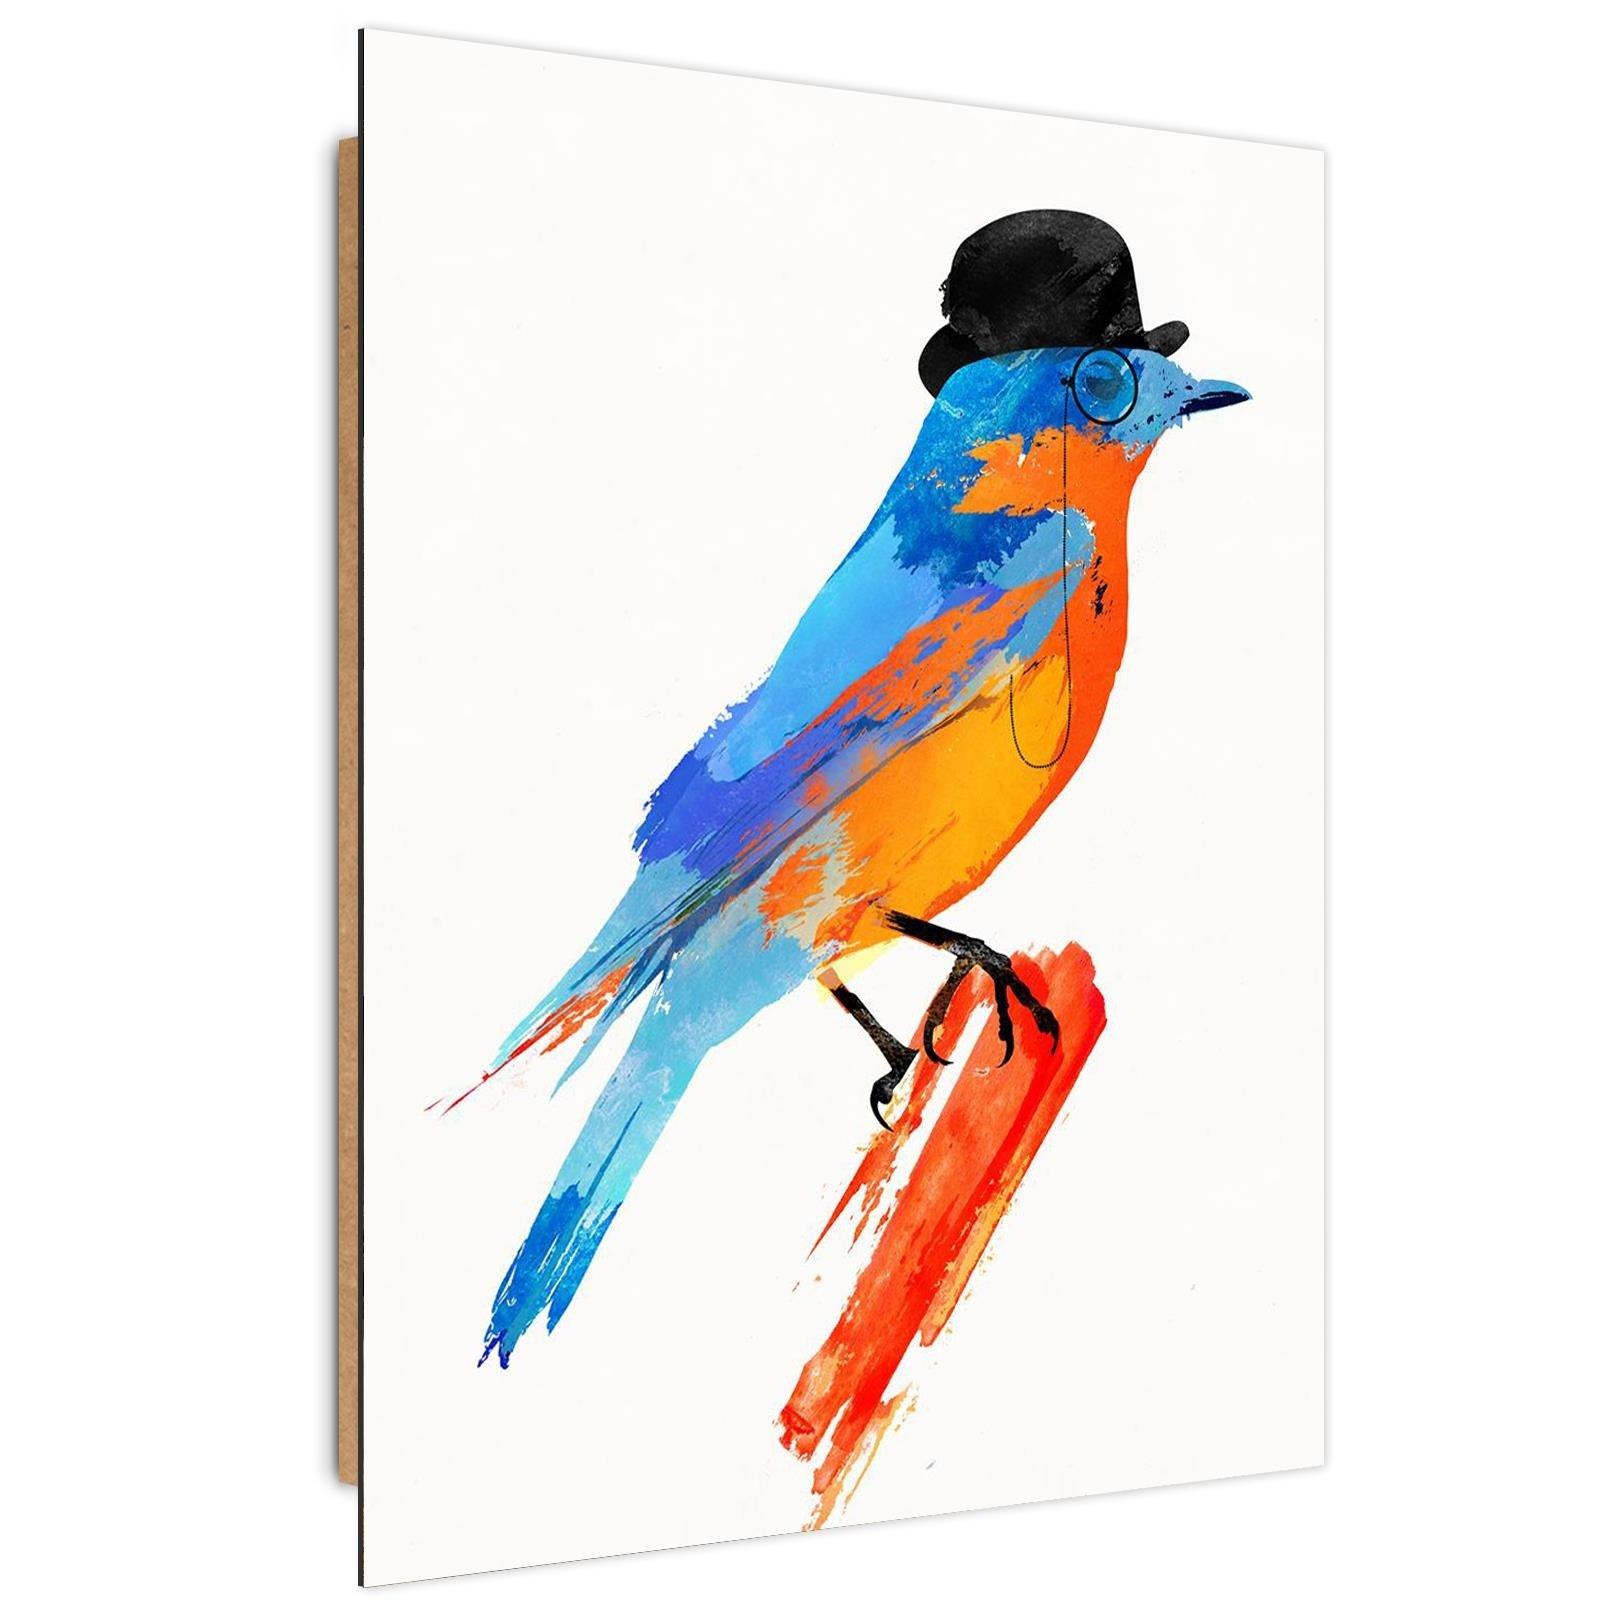 Tableau enfant bois bird in a bowler hat orange 70x100